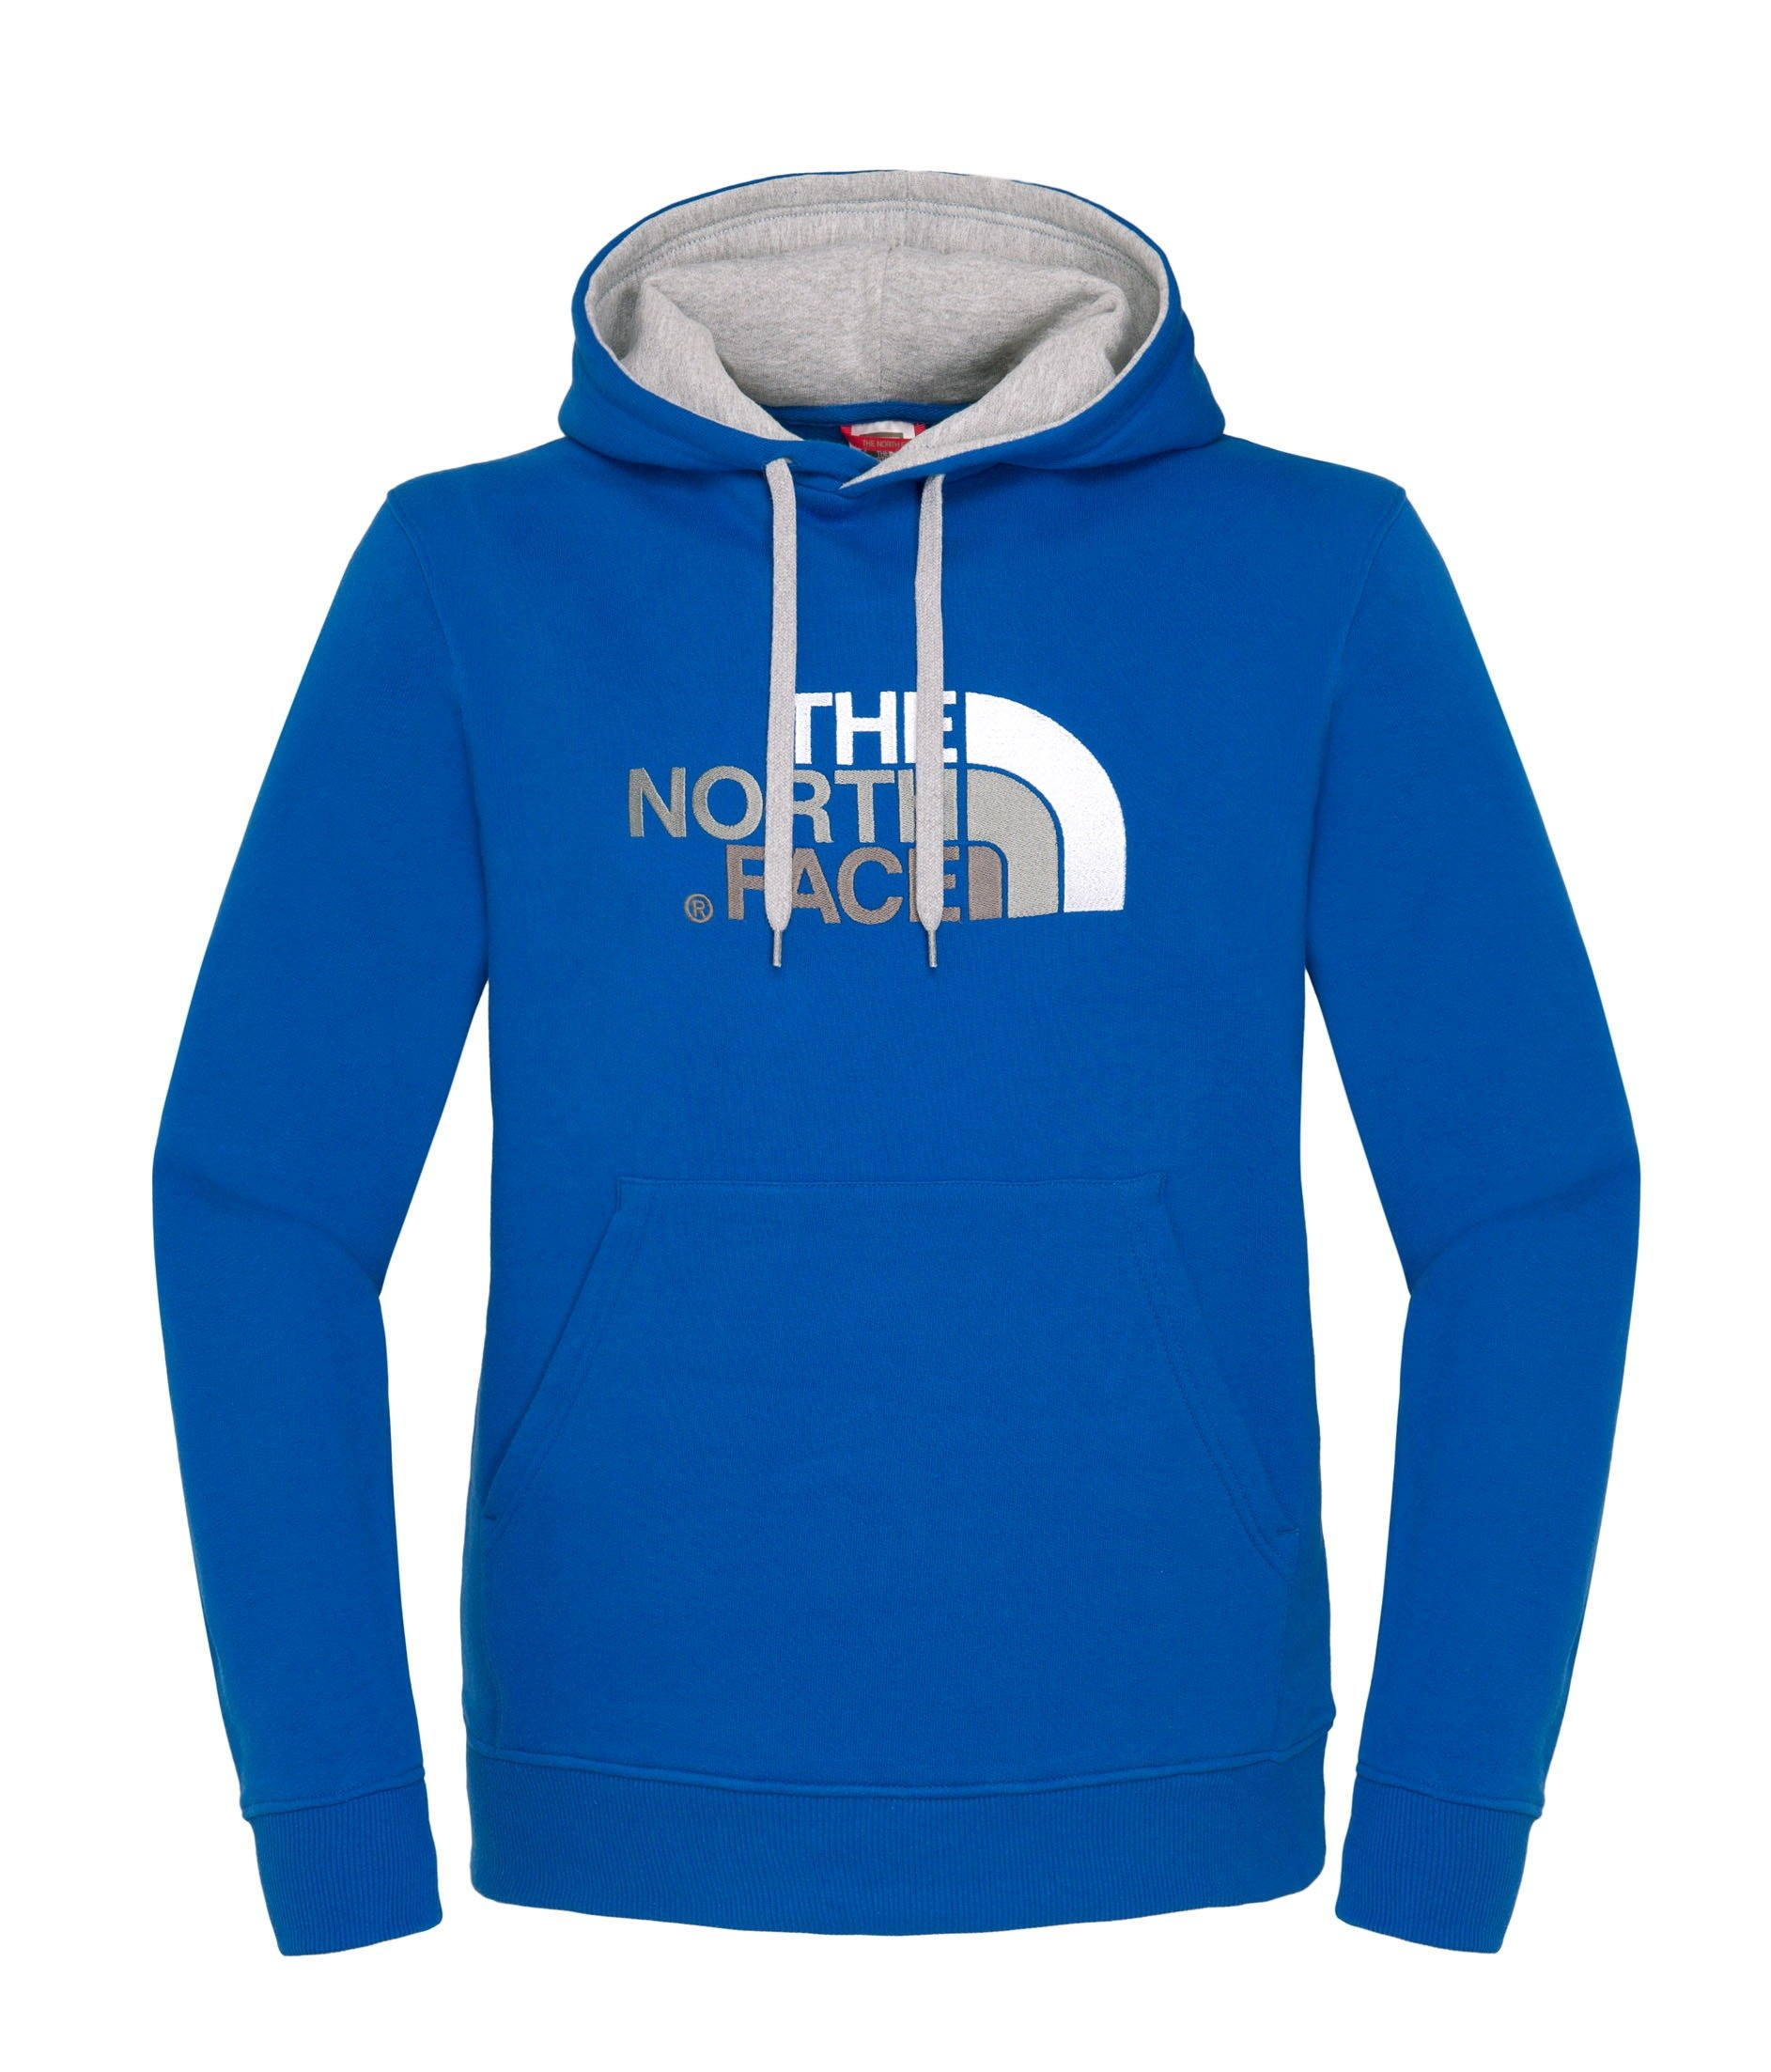 The north face Tnf m drew peak pullover hoodie på billigsport24